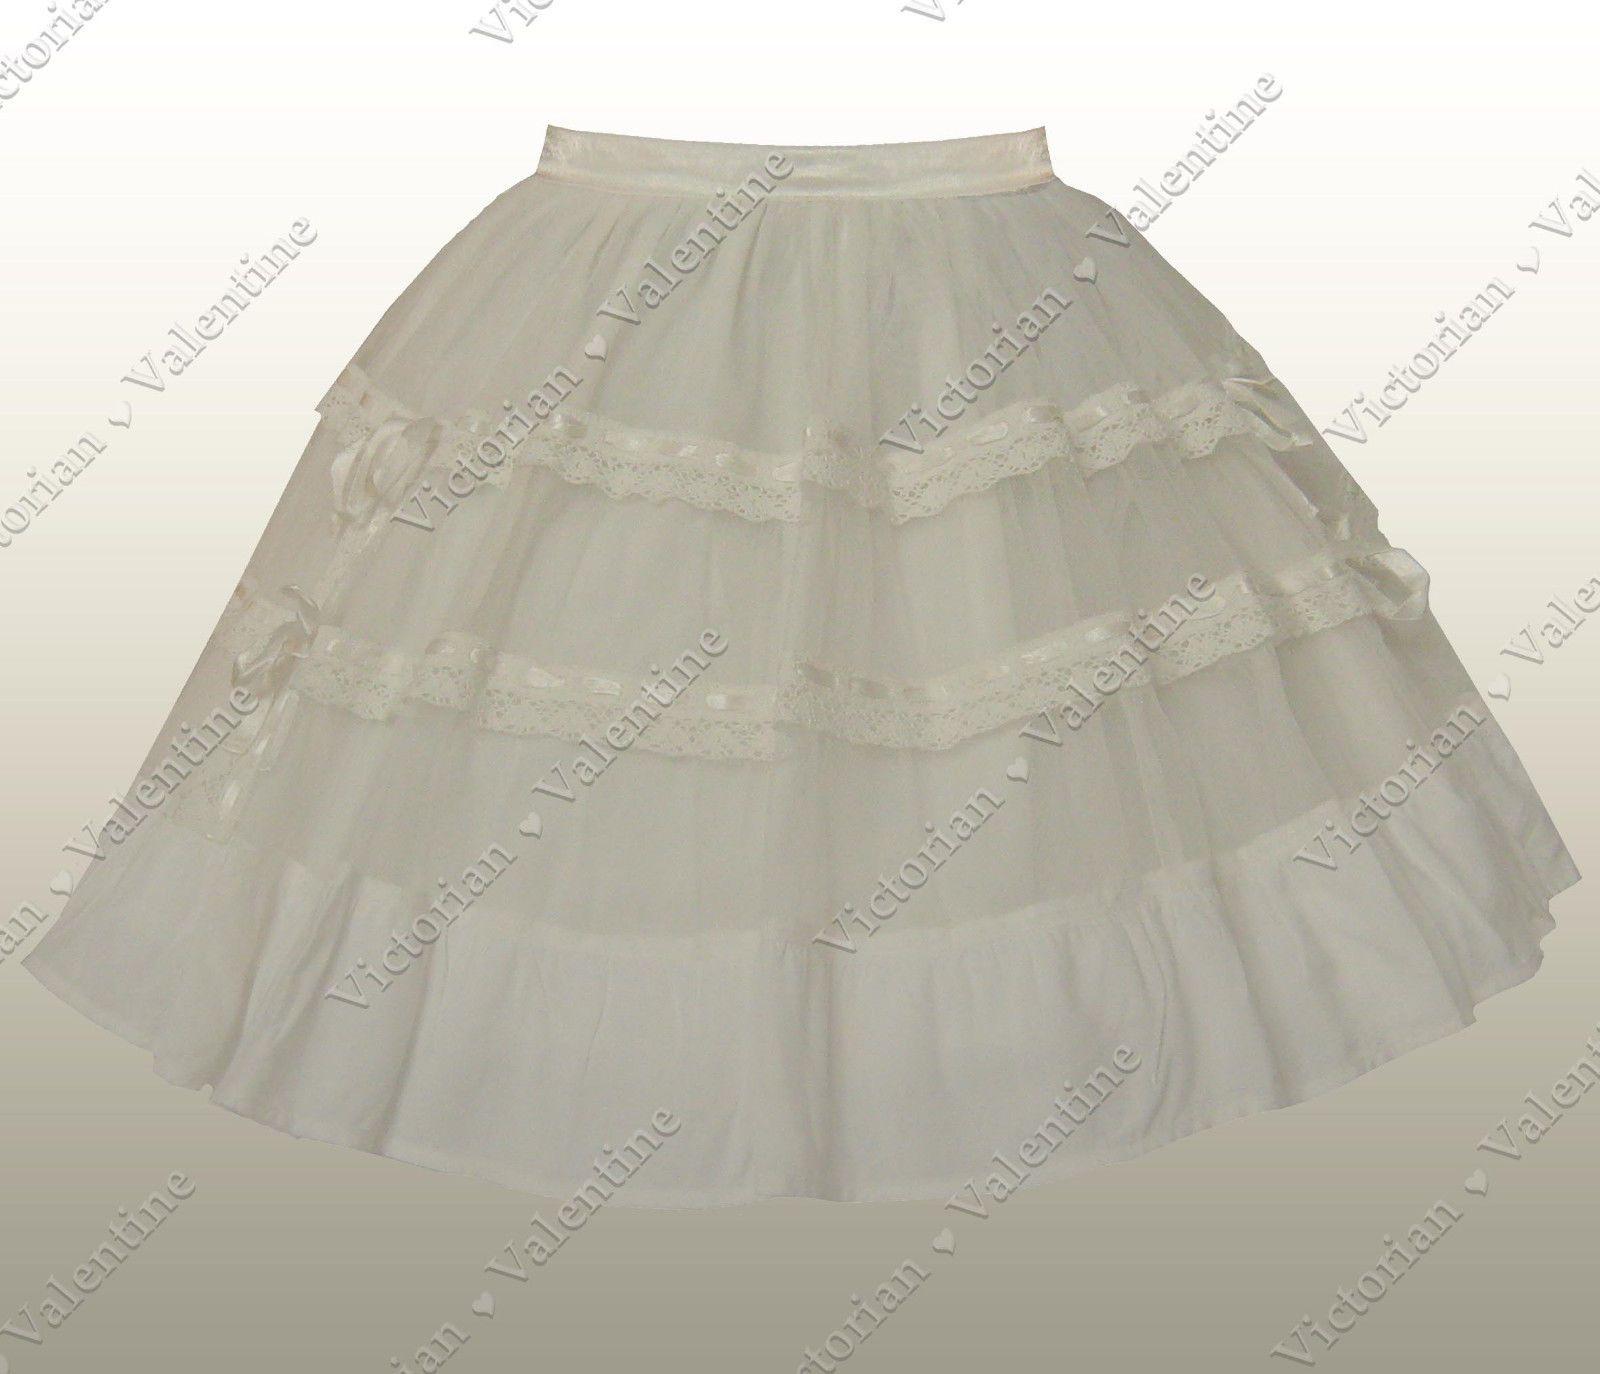 Victorian wedding gothic steampunk fairy lolita corset shirt u skirt